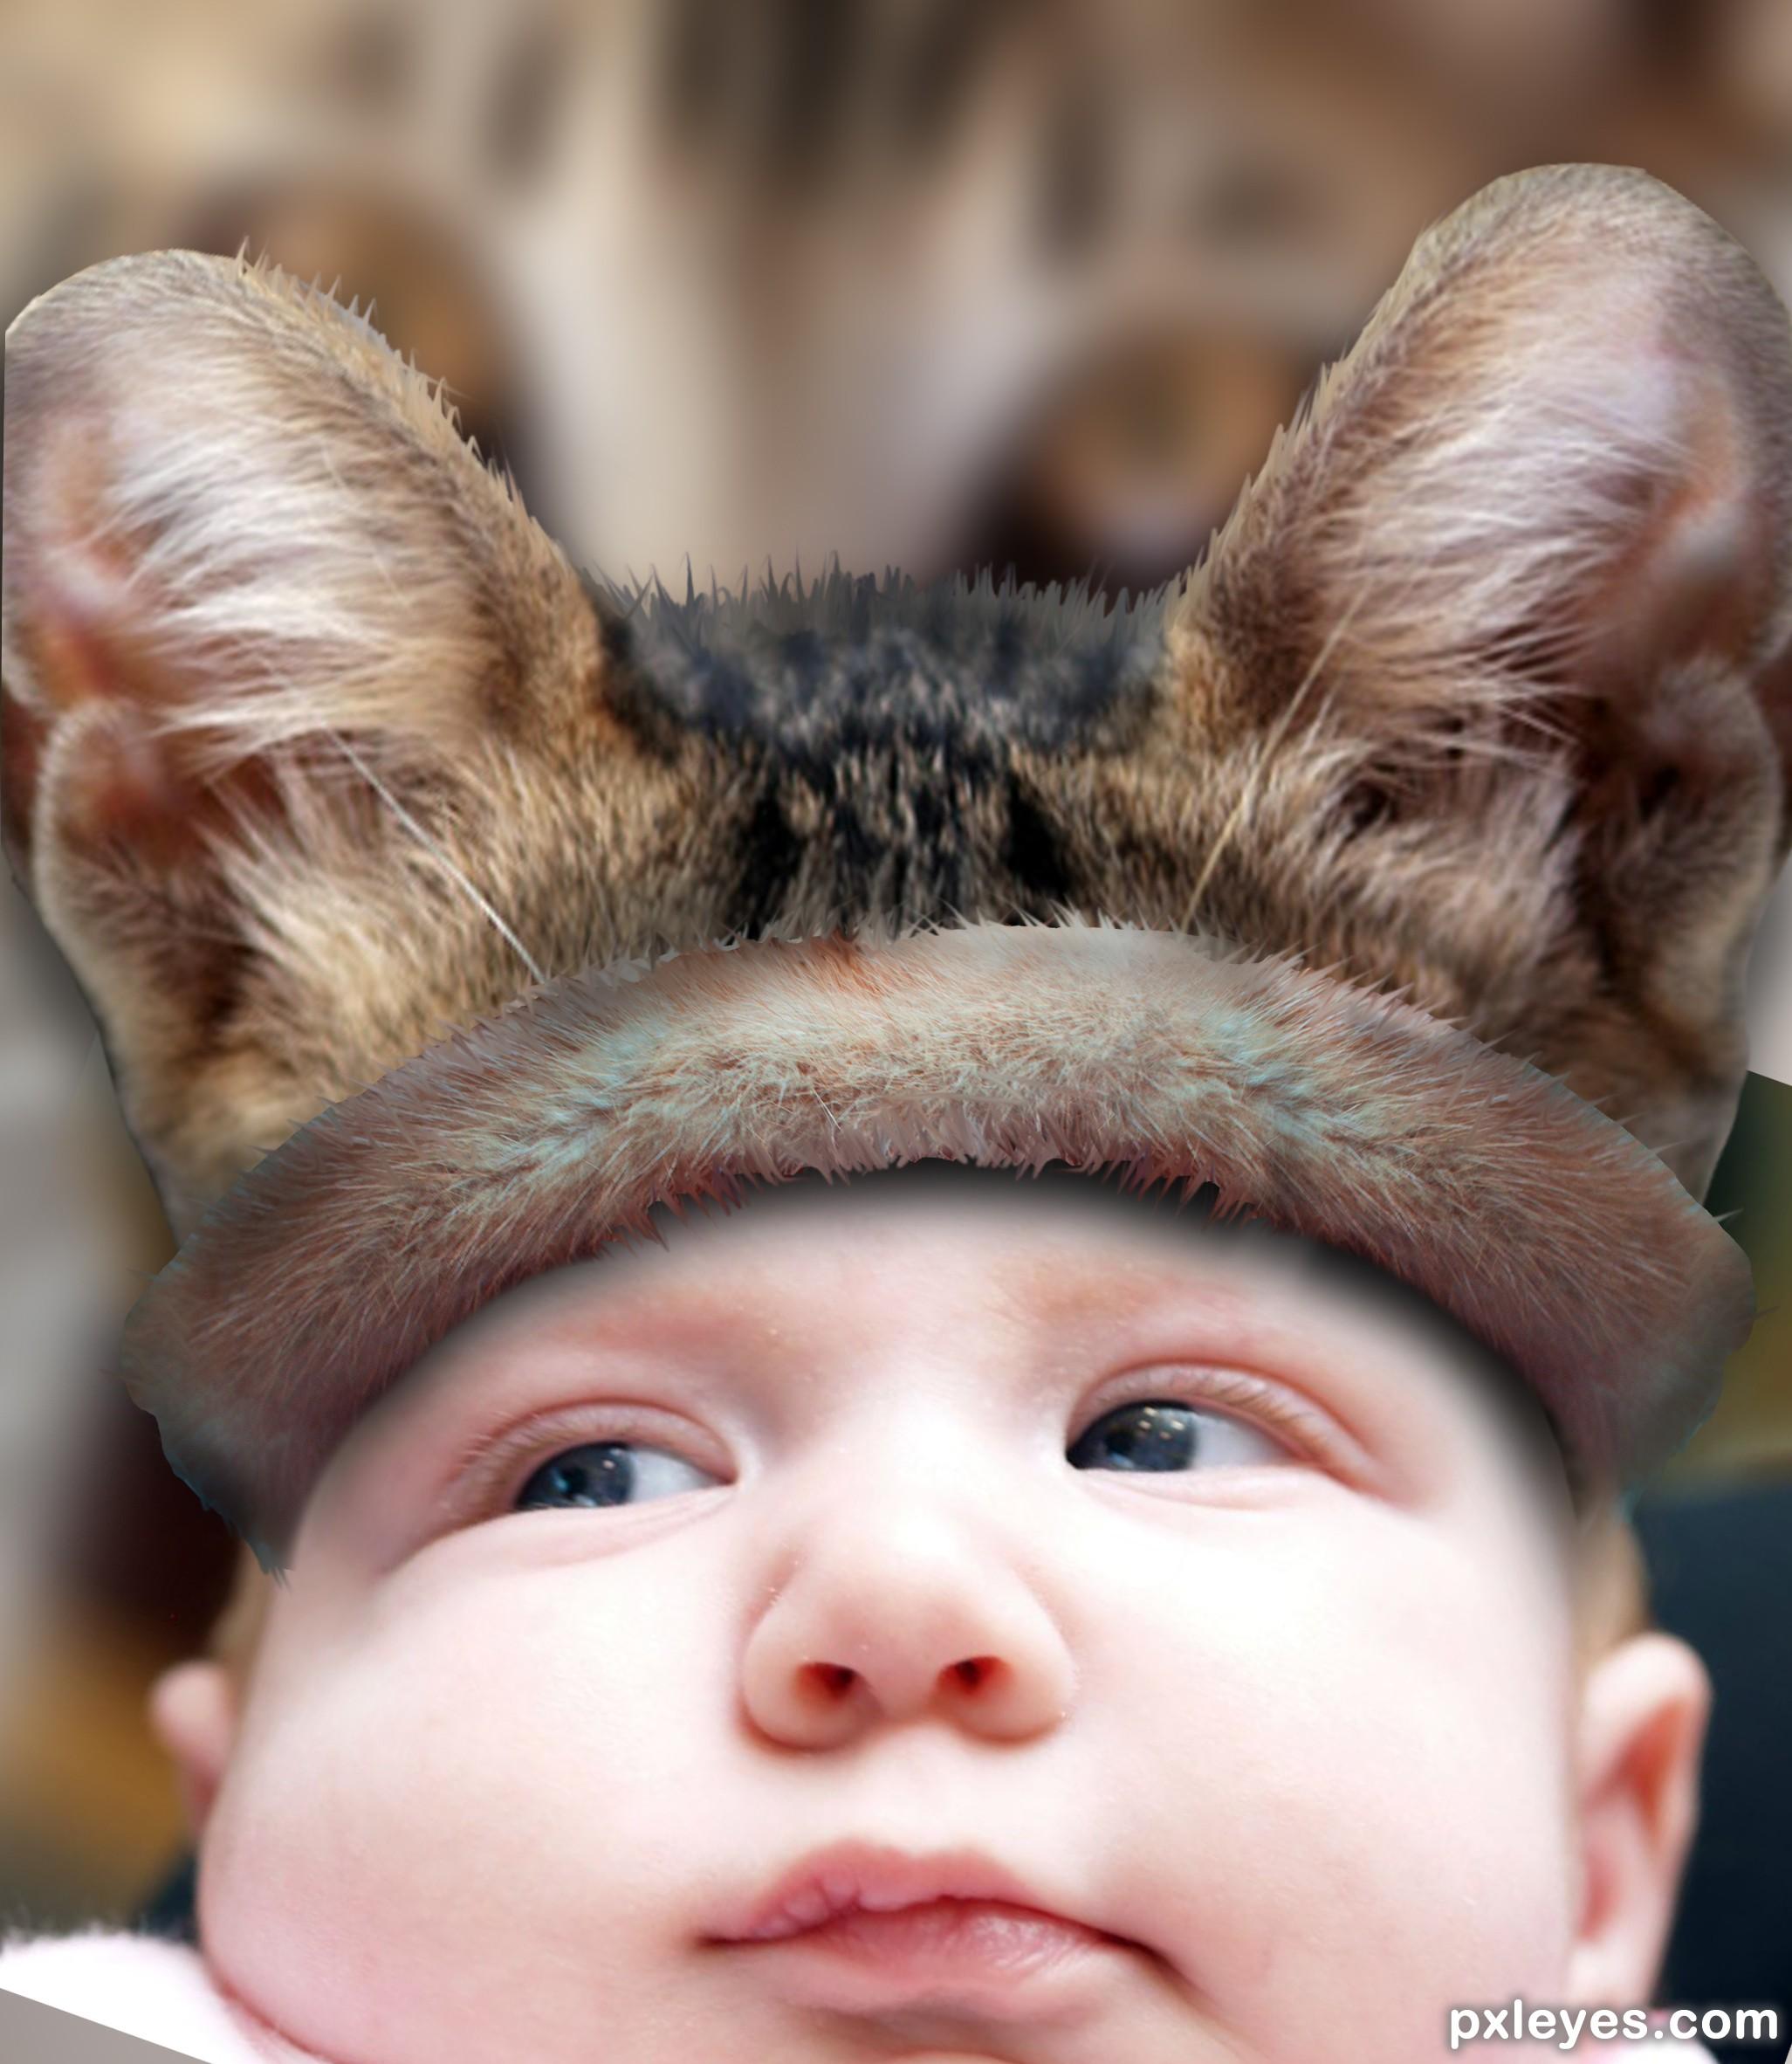 Crazy Hats Photoshop Contest (21292), Pictures Page 1